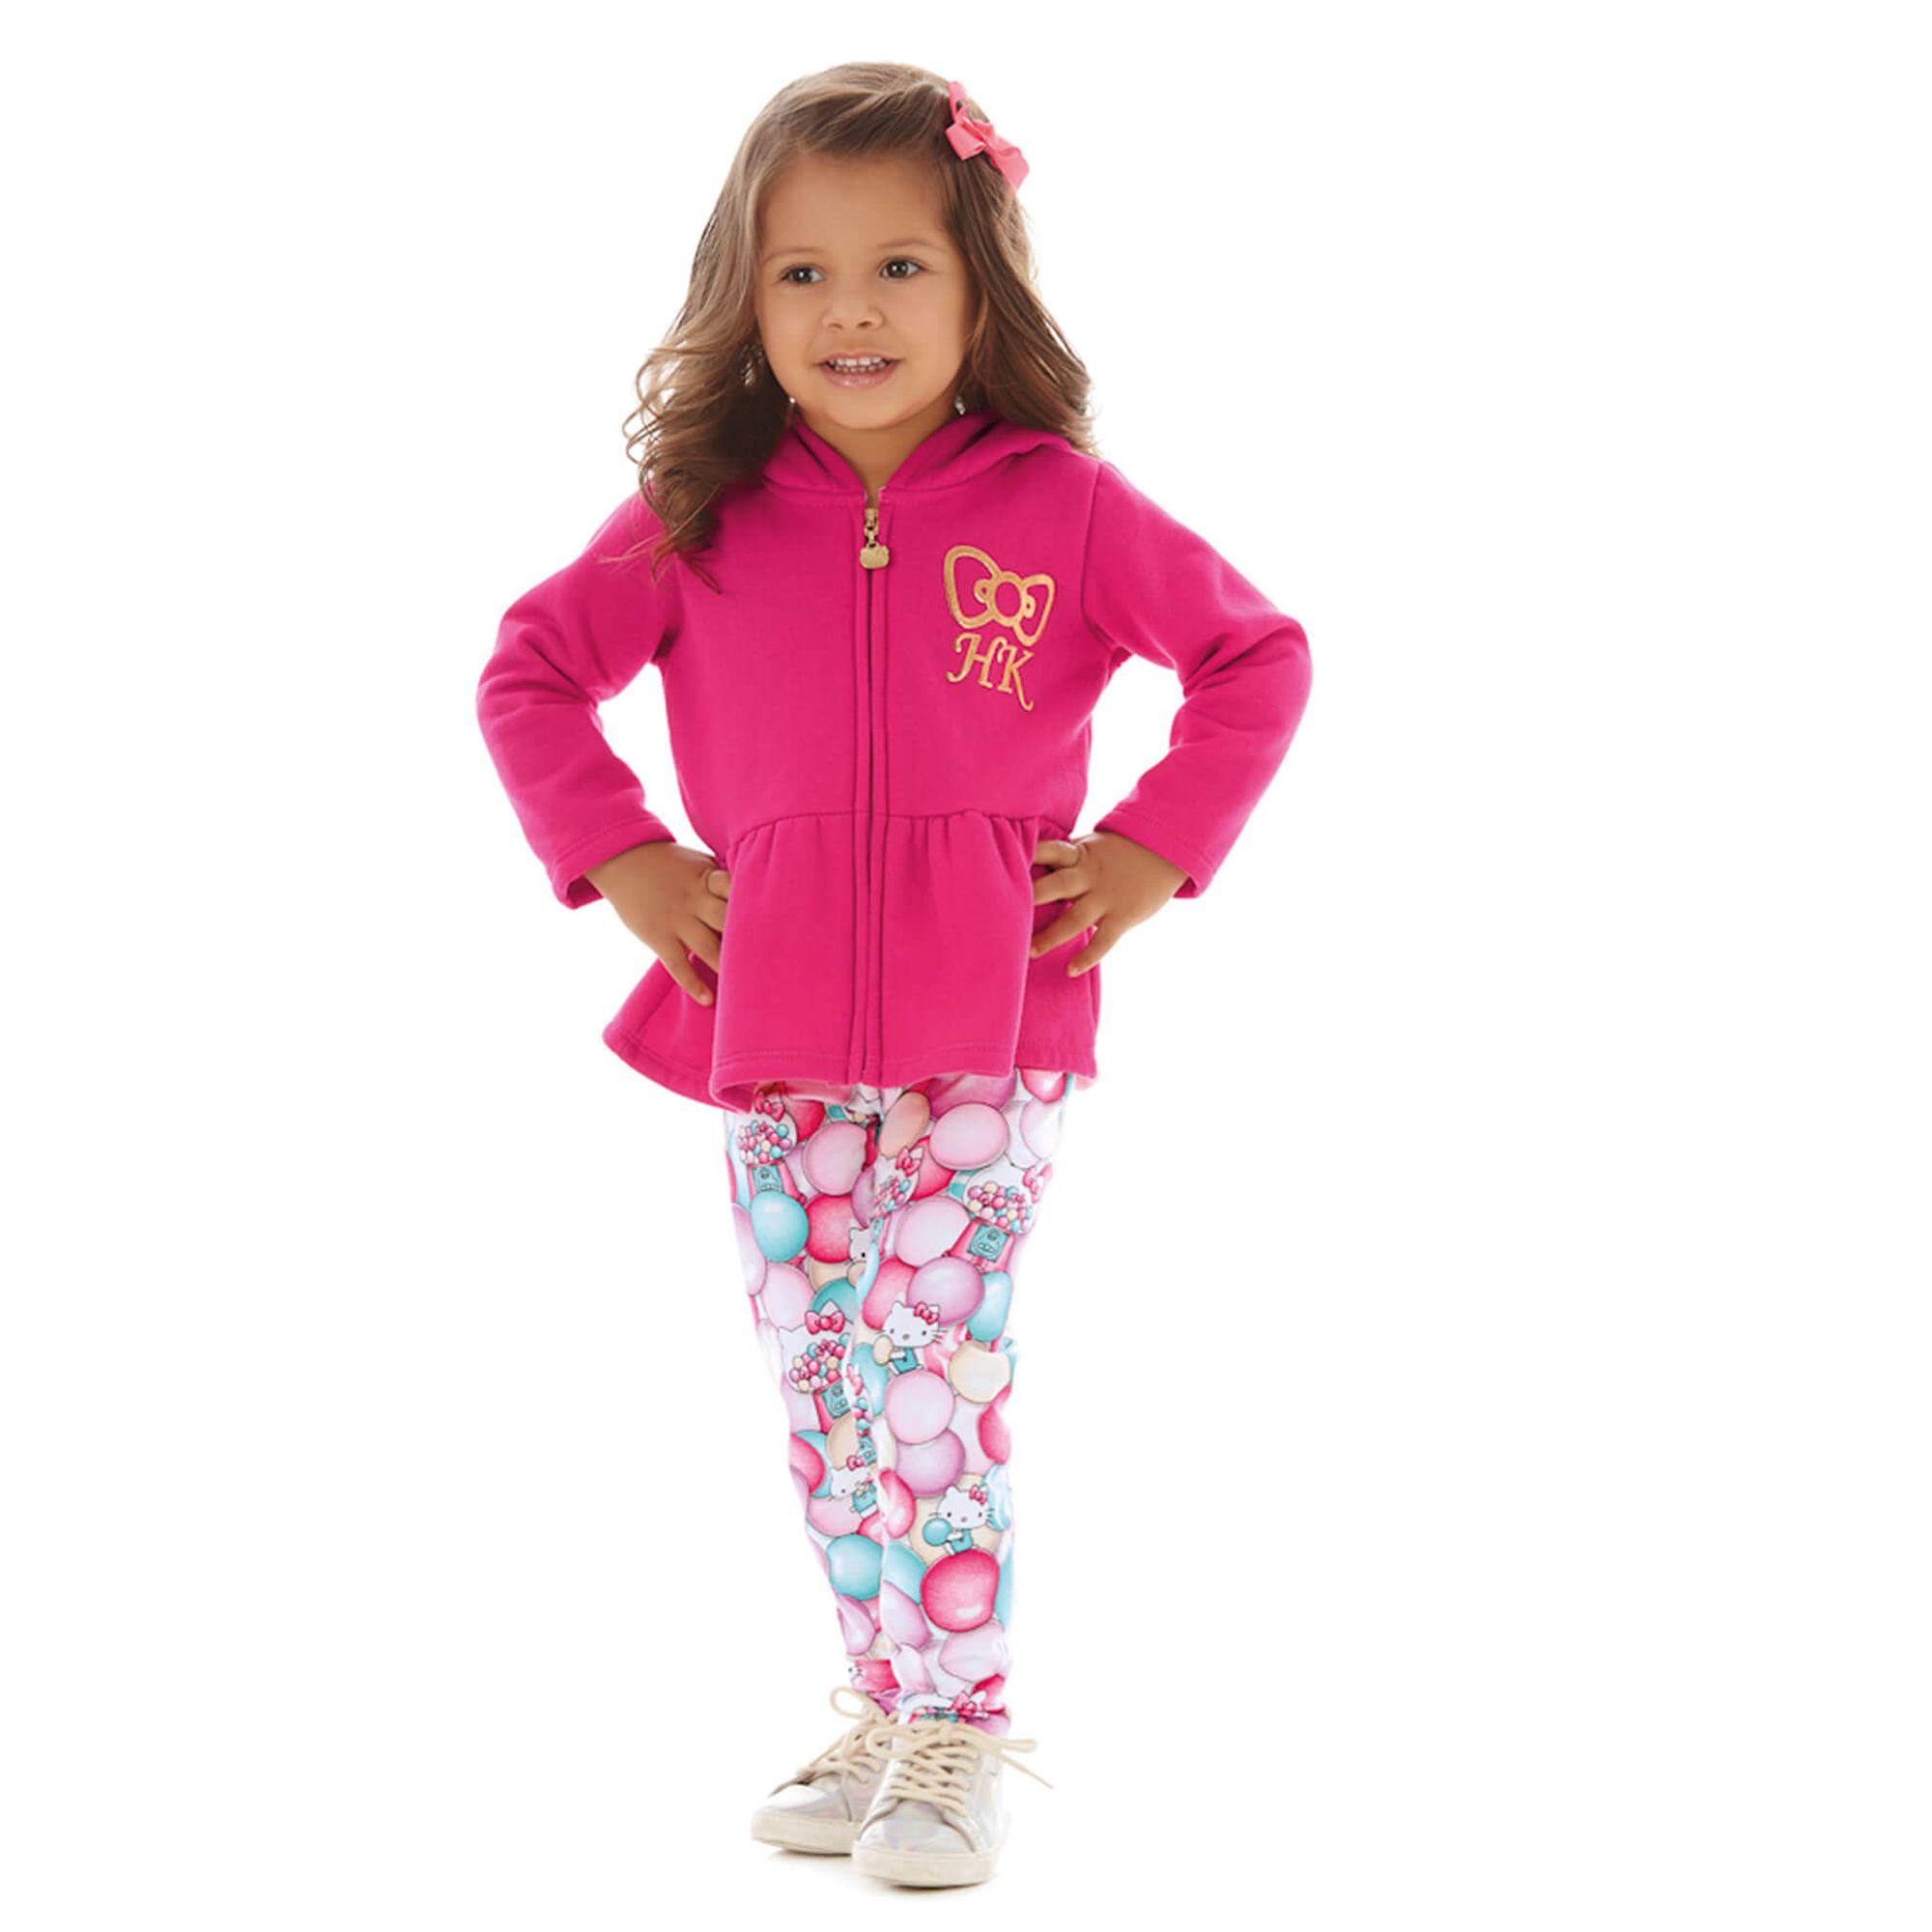 ae95297390 Jaqueta Moletom Menina Pink c  Legging Estampada Hello Kitty - EcaMeleca